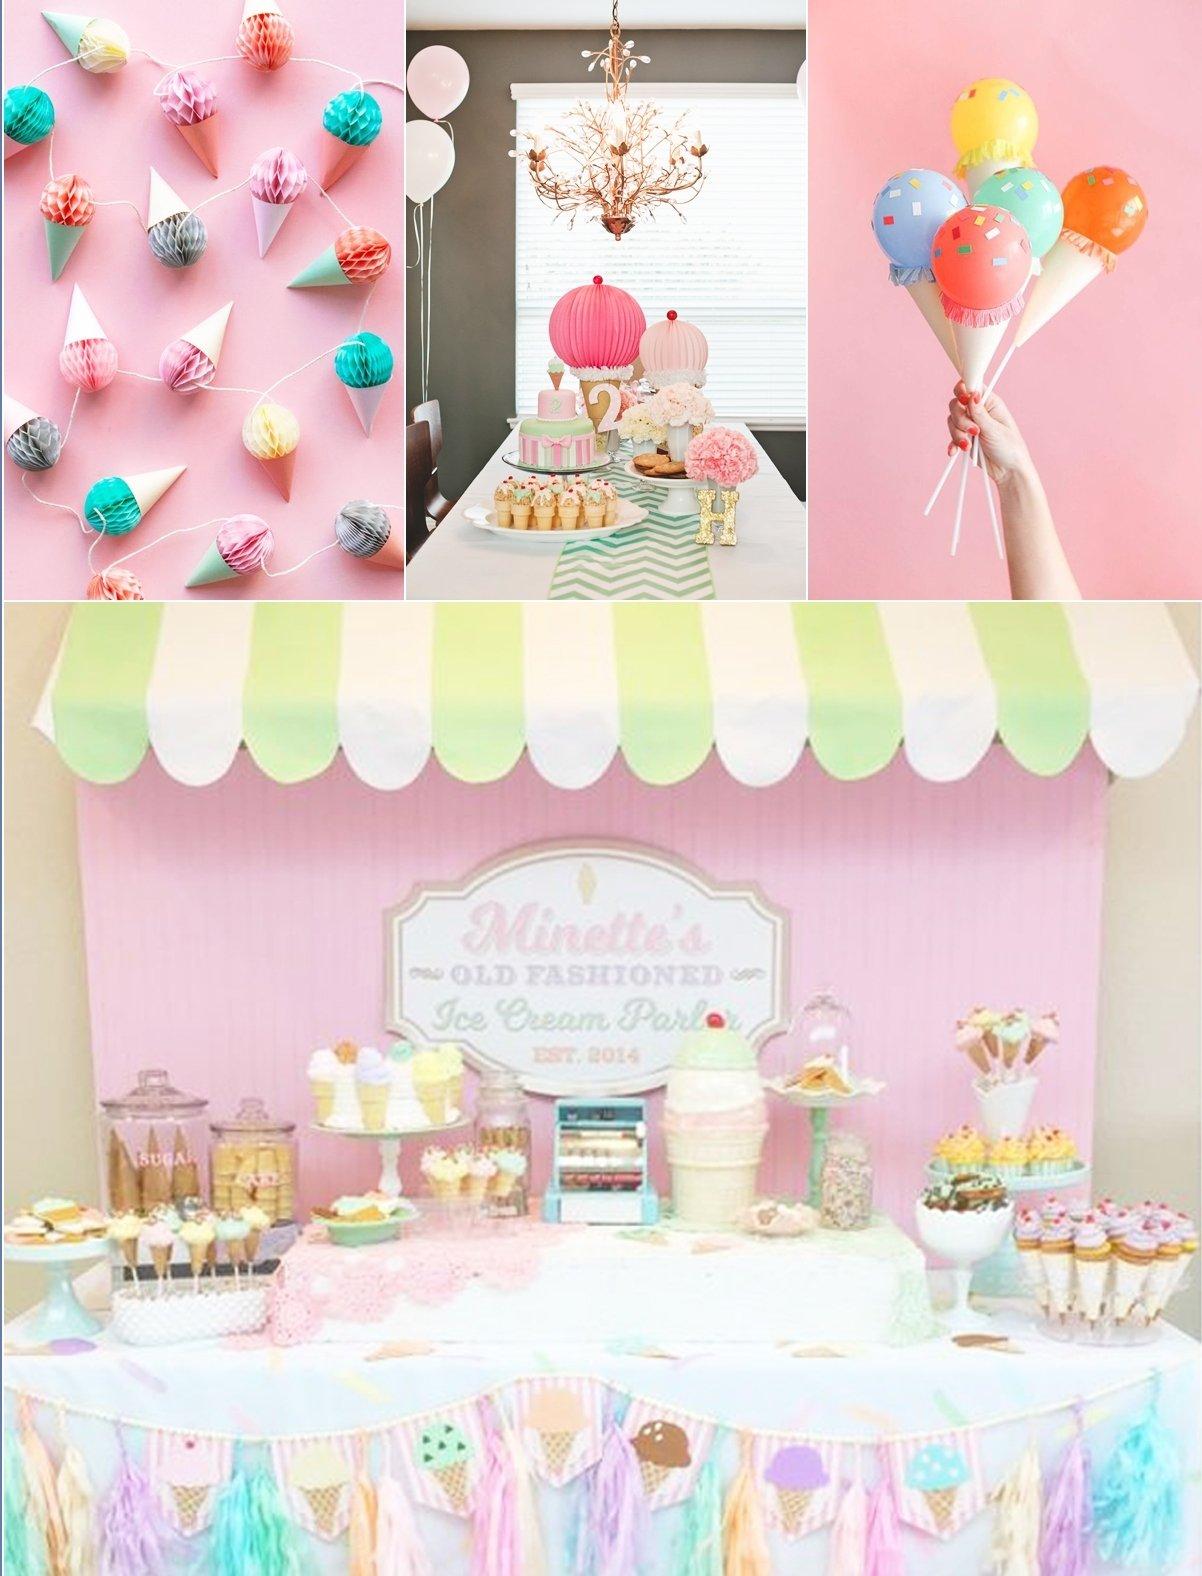 10 Fabulous Ice Cream Birthday Party Ideas ice cream theme party bop till you drop 2020